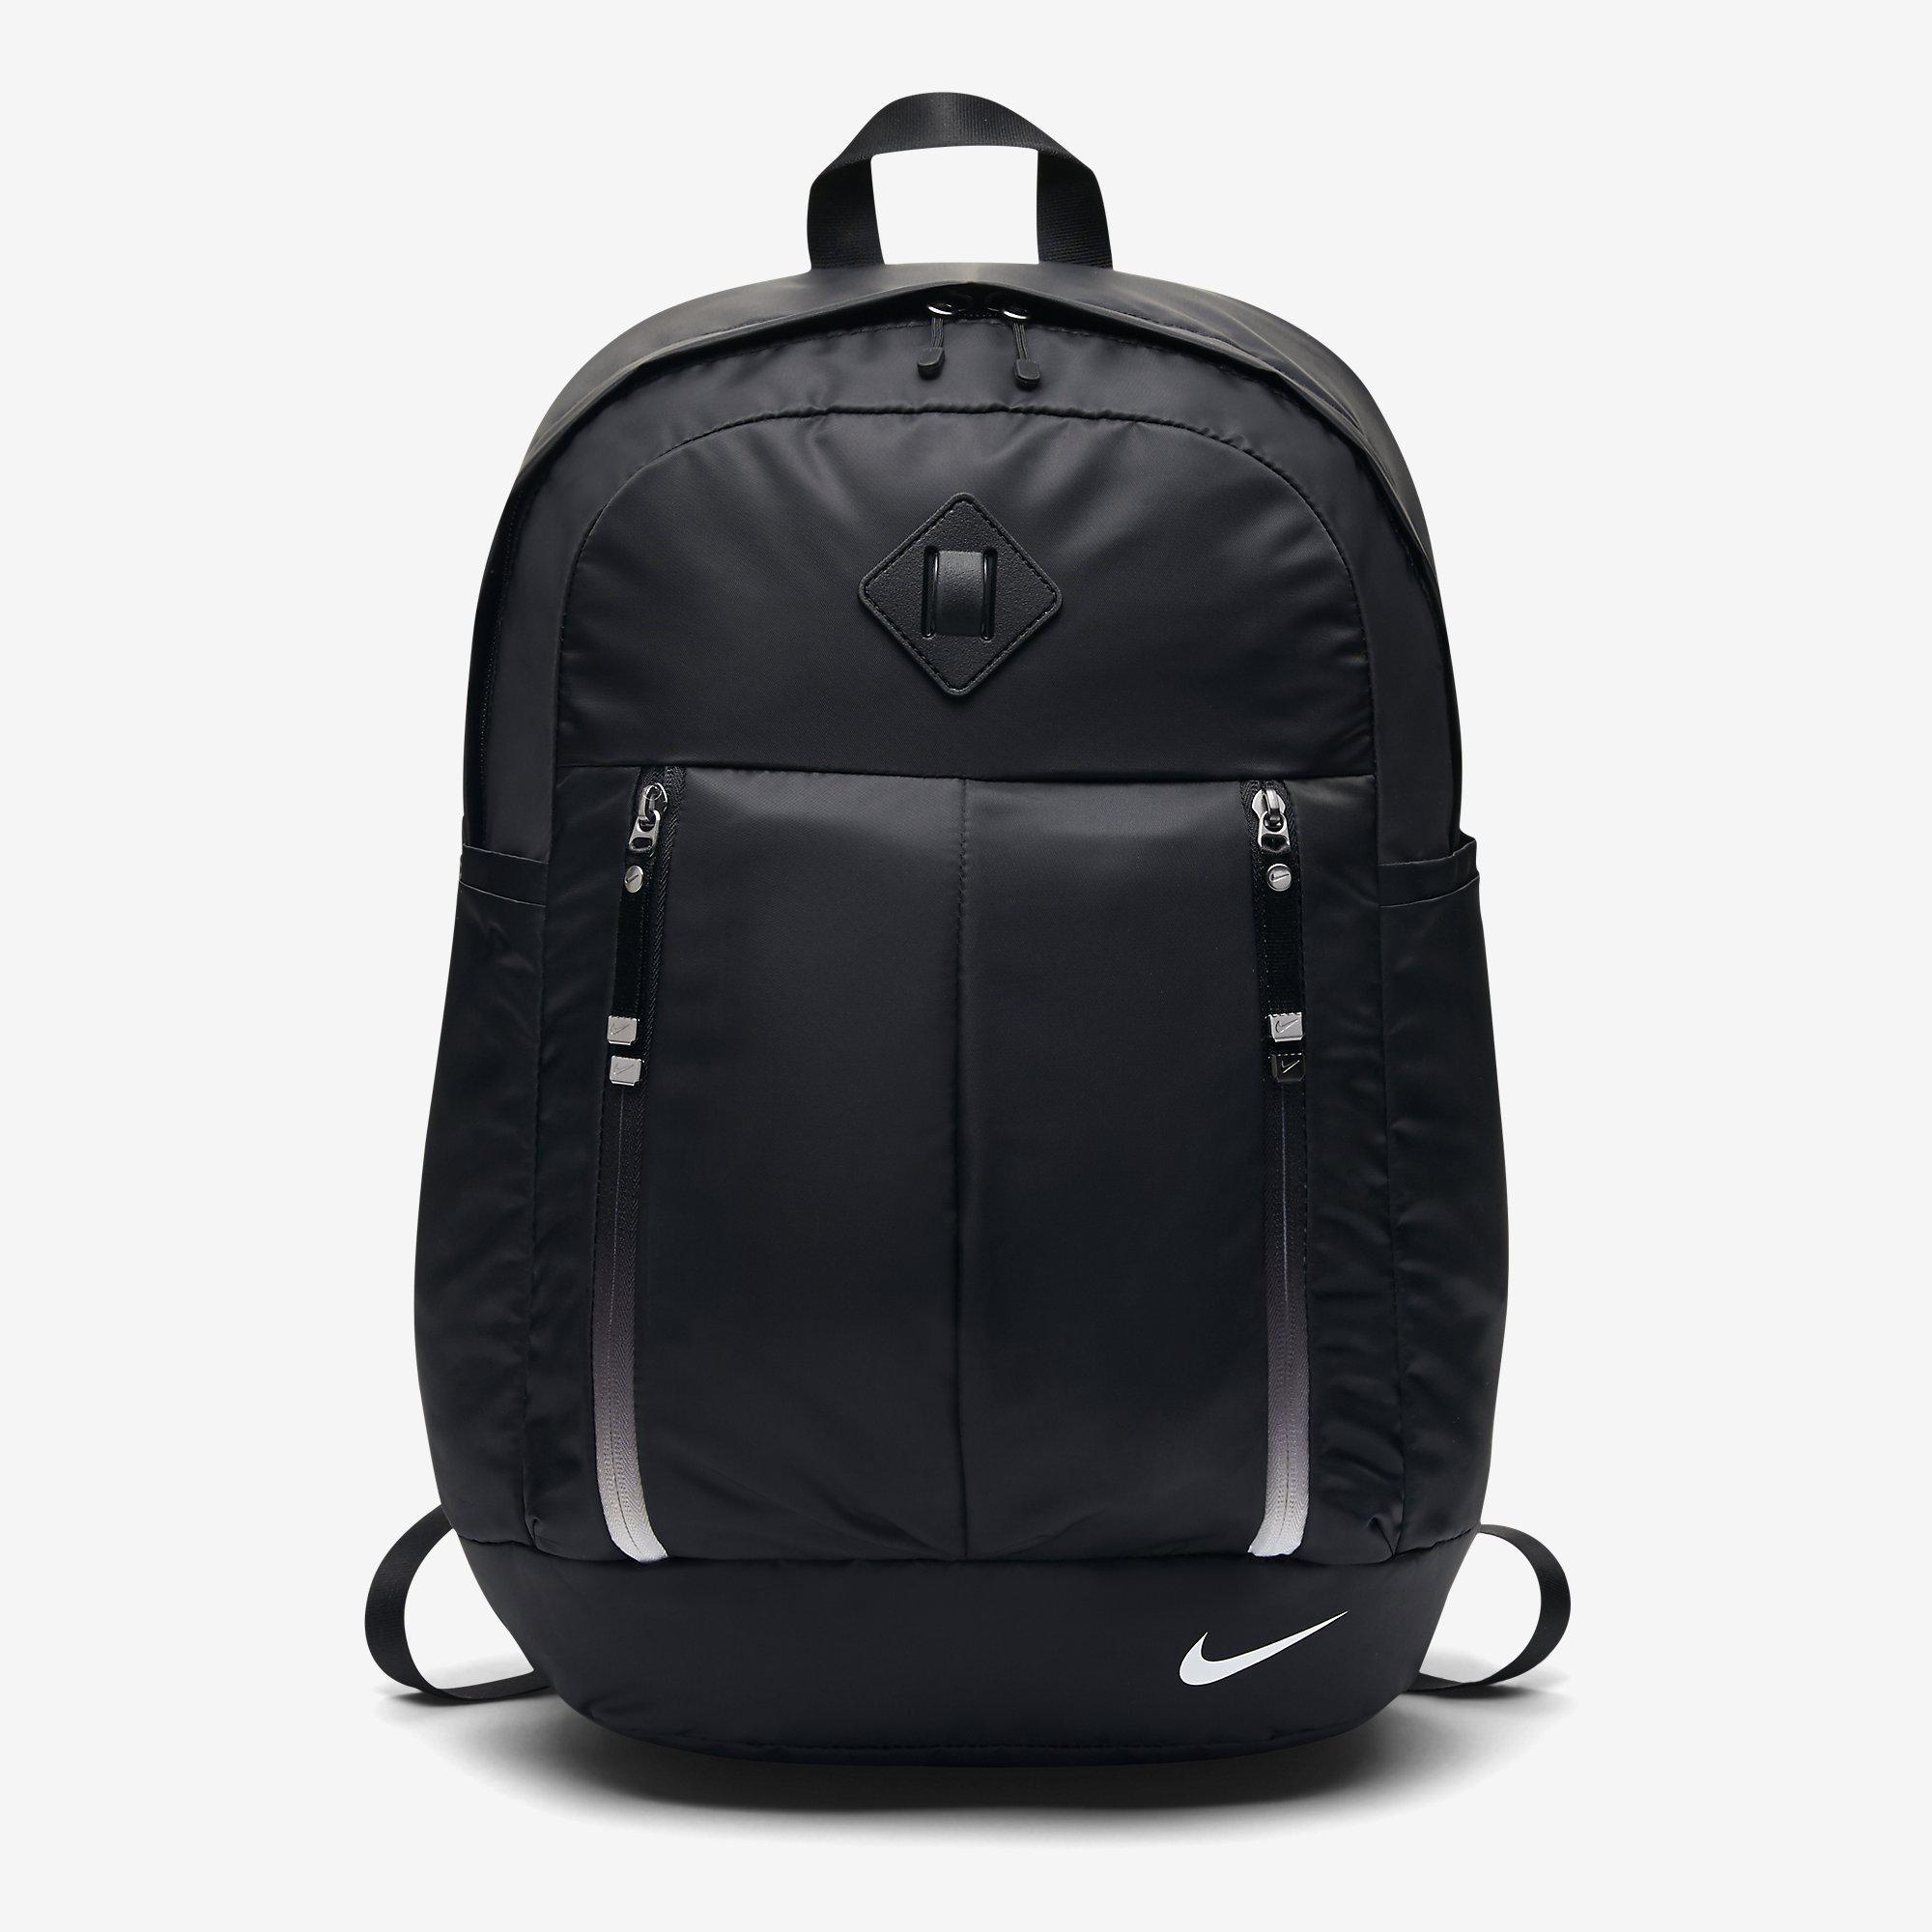 0eabe3401867a Nike Womens Auralux Training Backpack - Black White - Tennisnuts.com